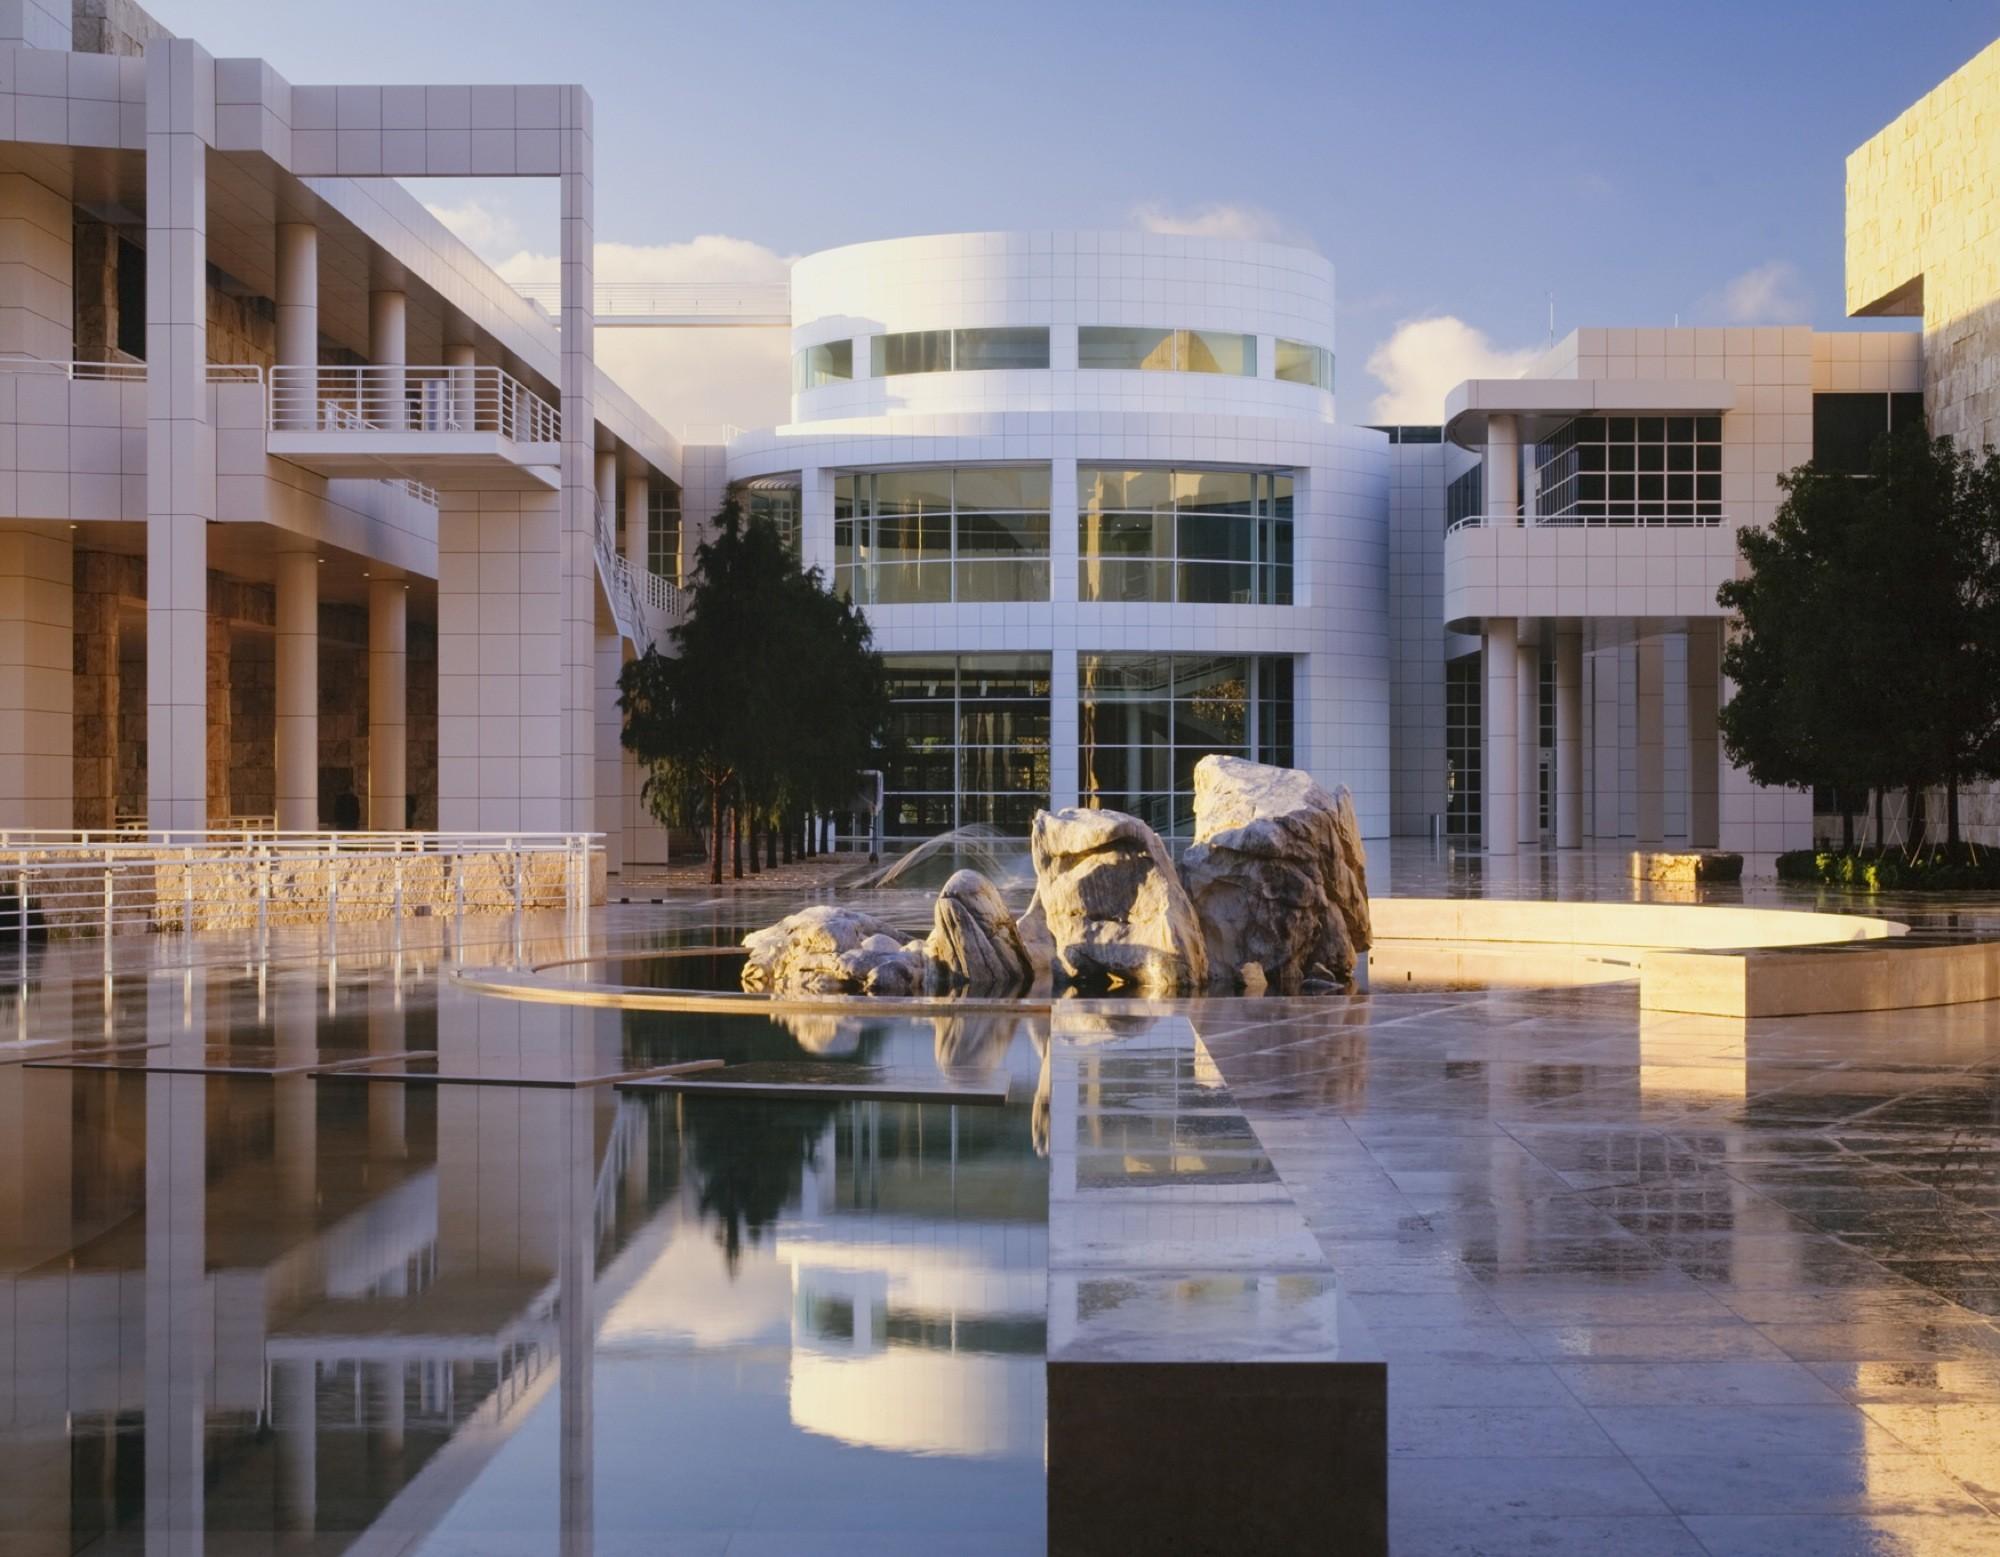 AD Classics: Getty Center / Richard Meier & Partners, Architects LLP, Courtesy of richard meier & partners architects © scott frances esto